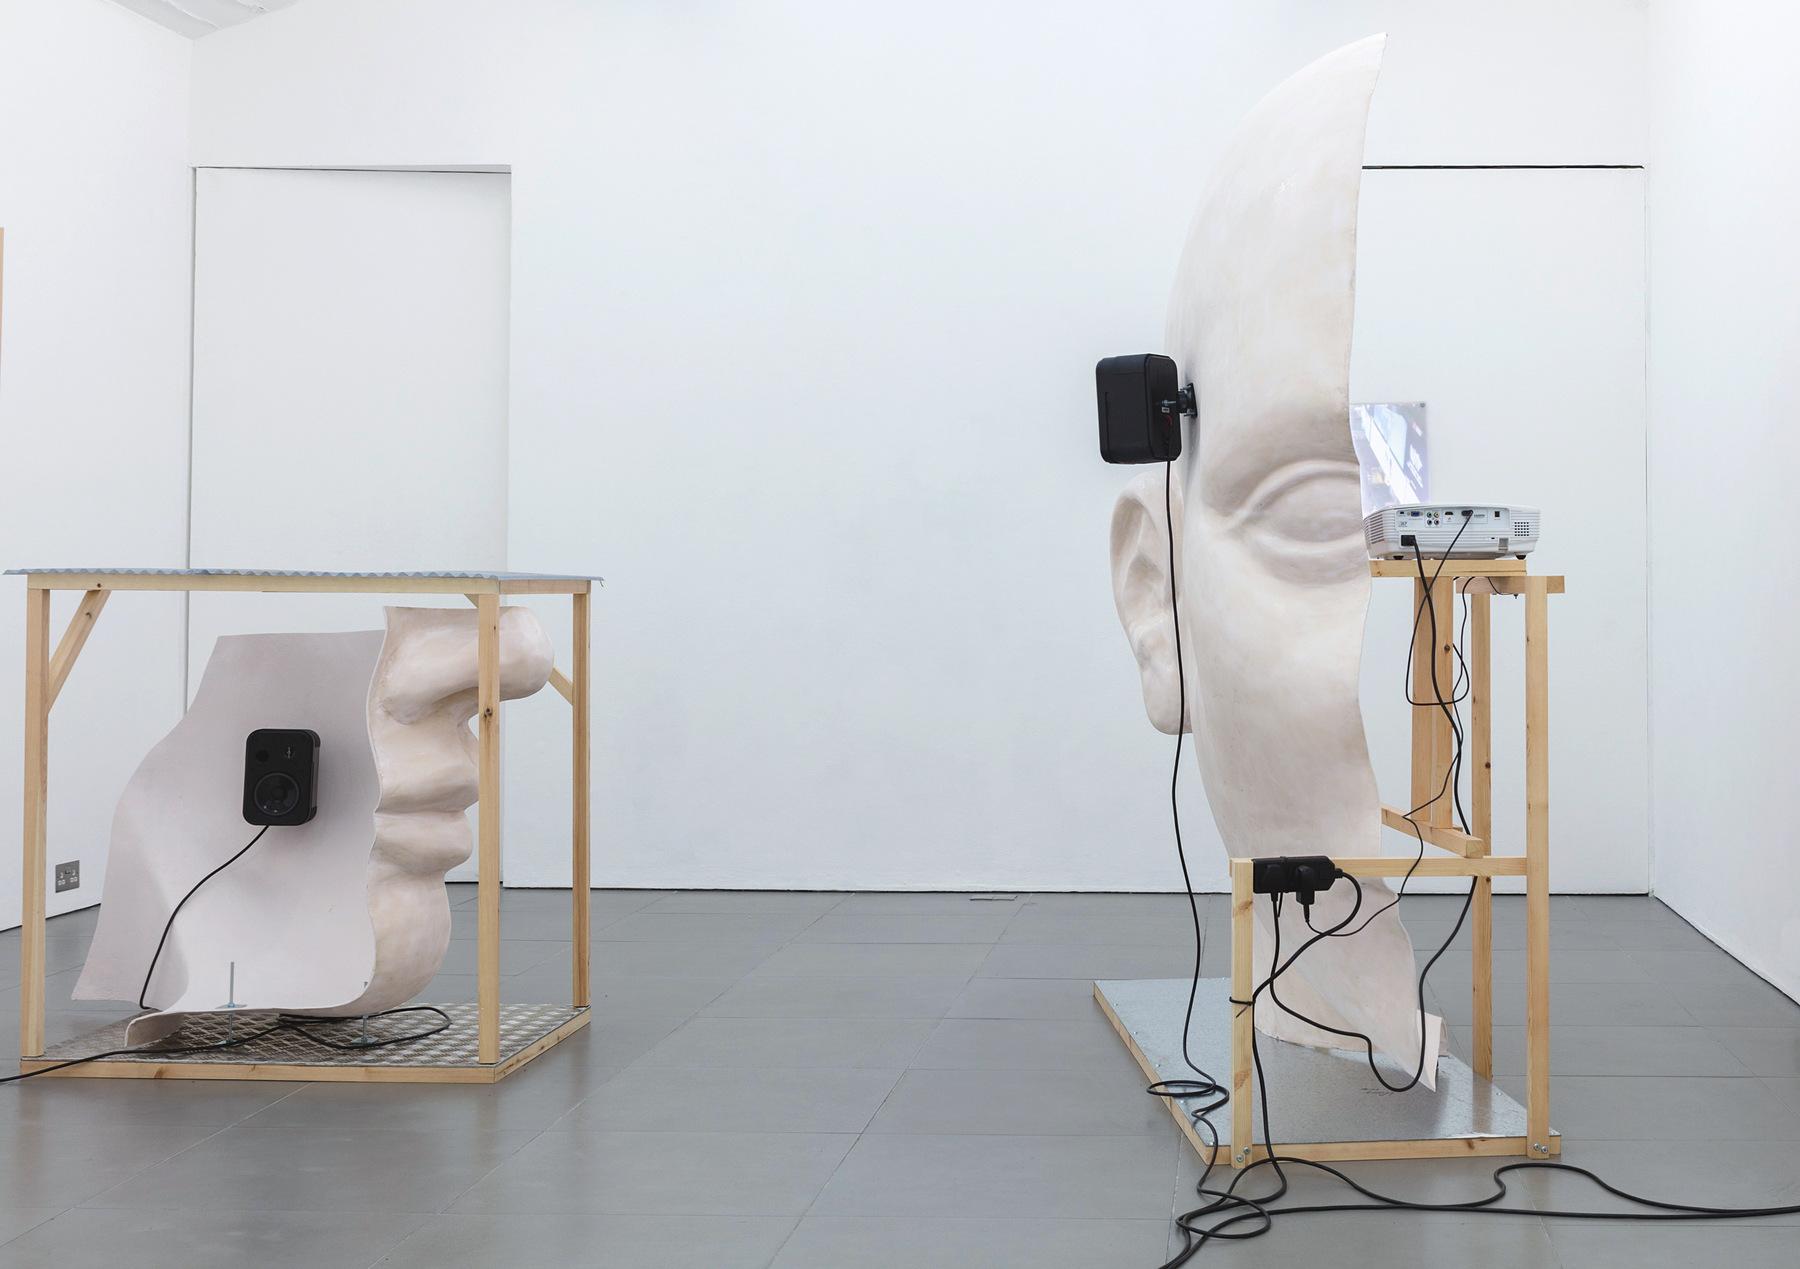 15. Anne de Vries, SUBMISSION 2015, wood, metal, fibreglass resin, audio, video